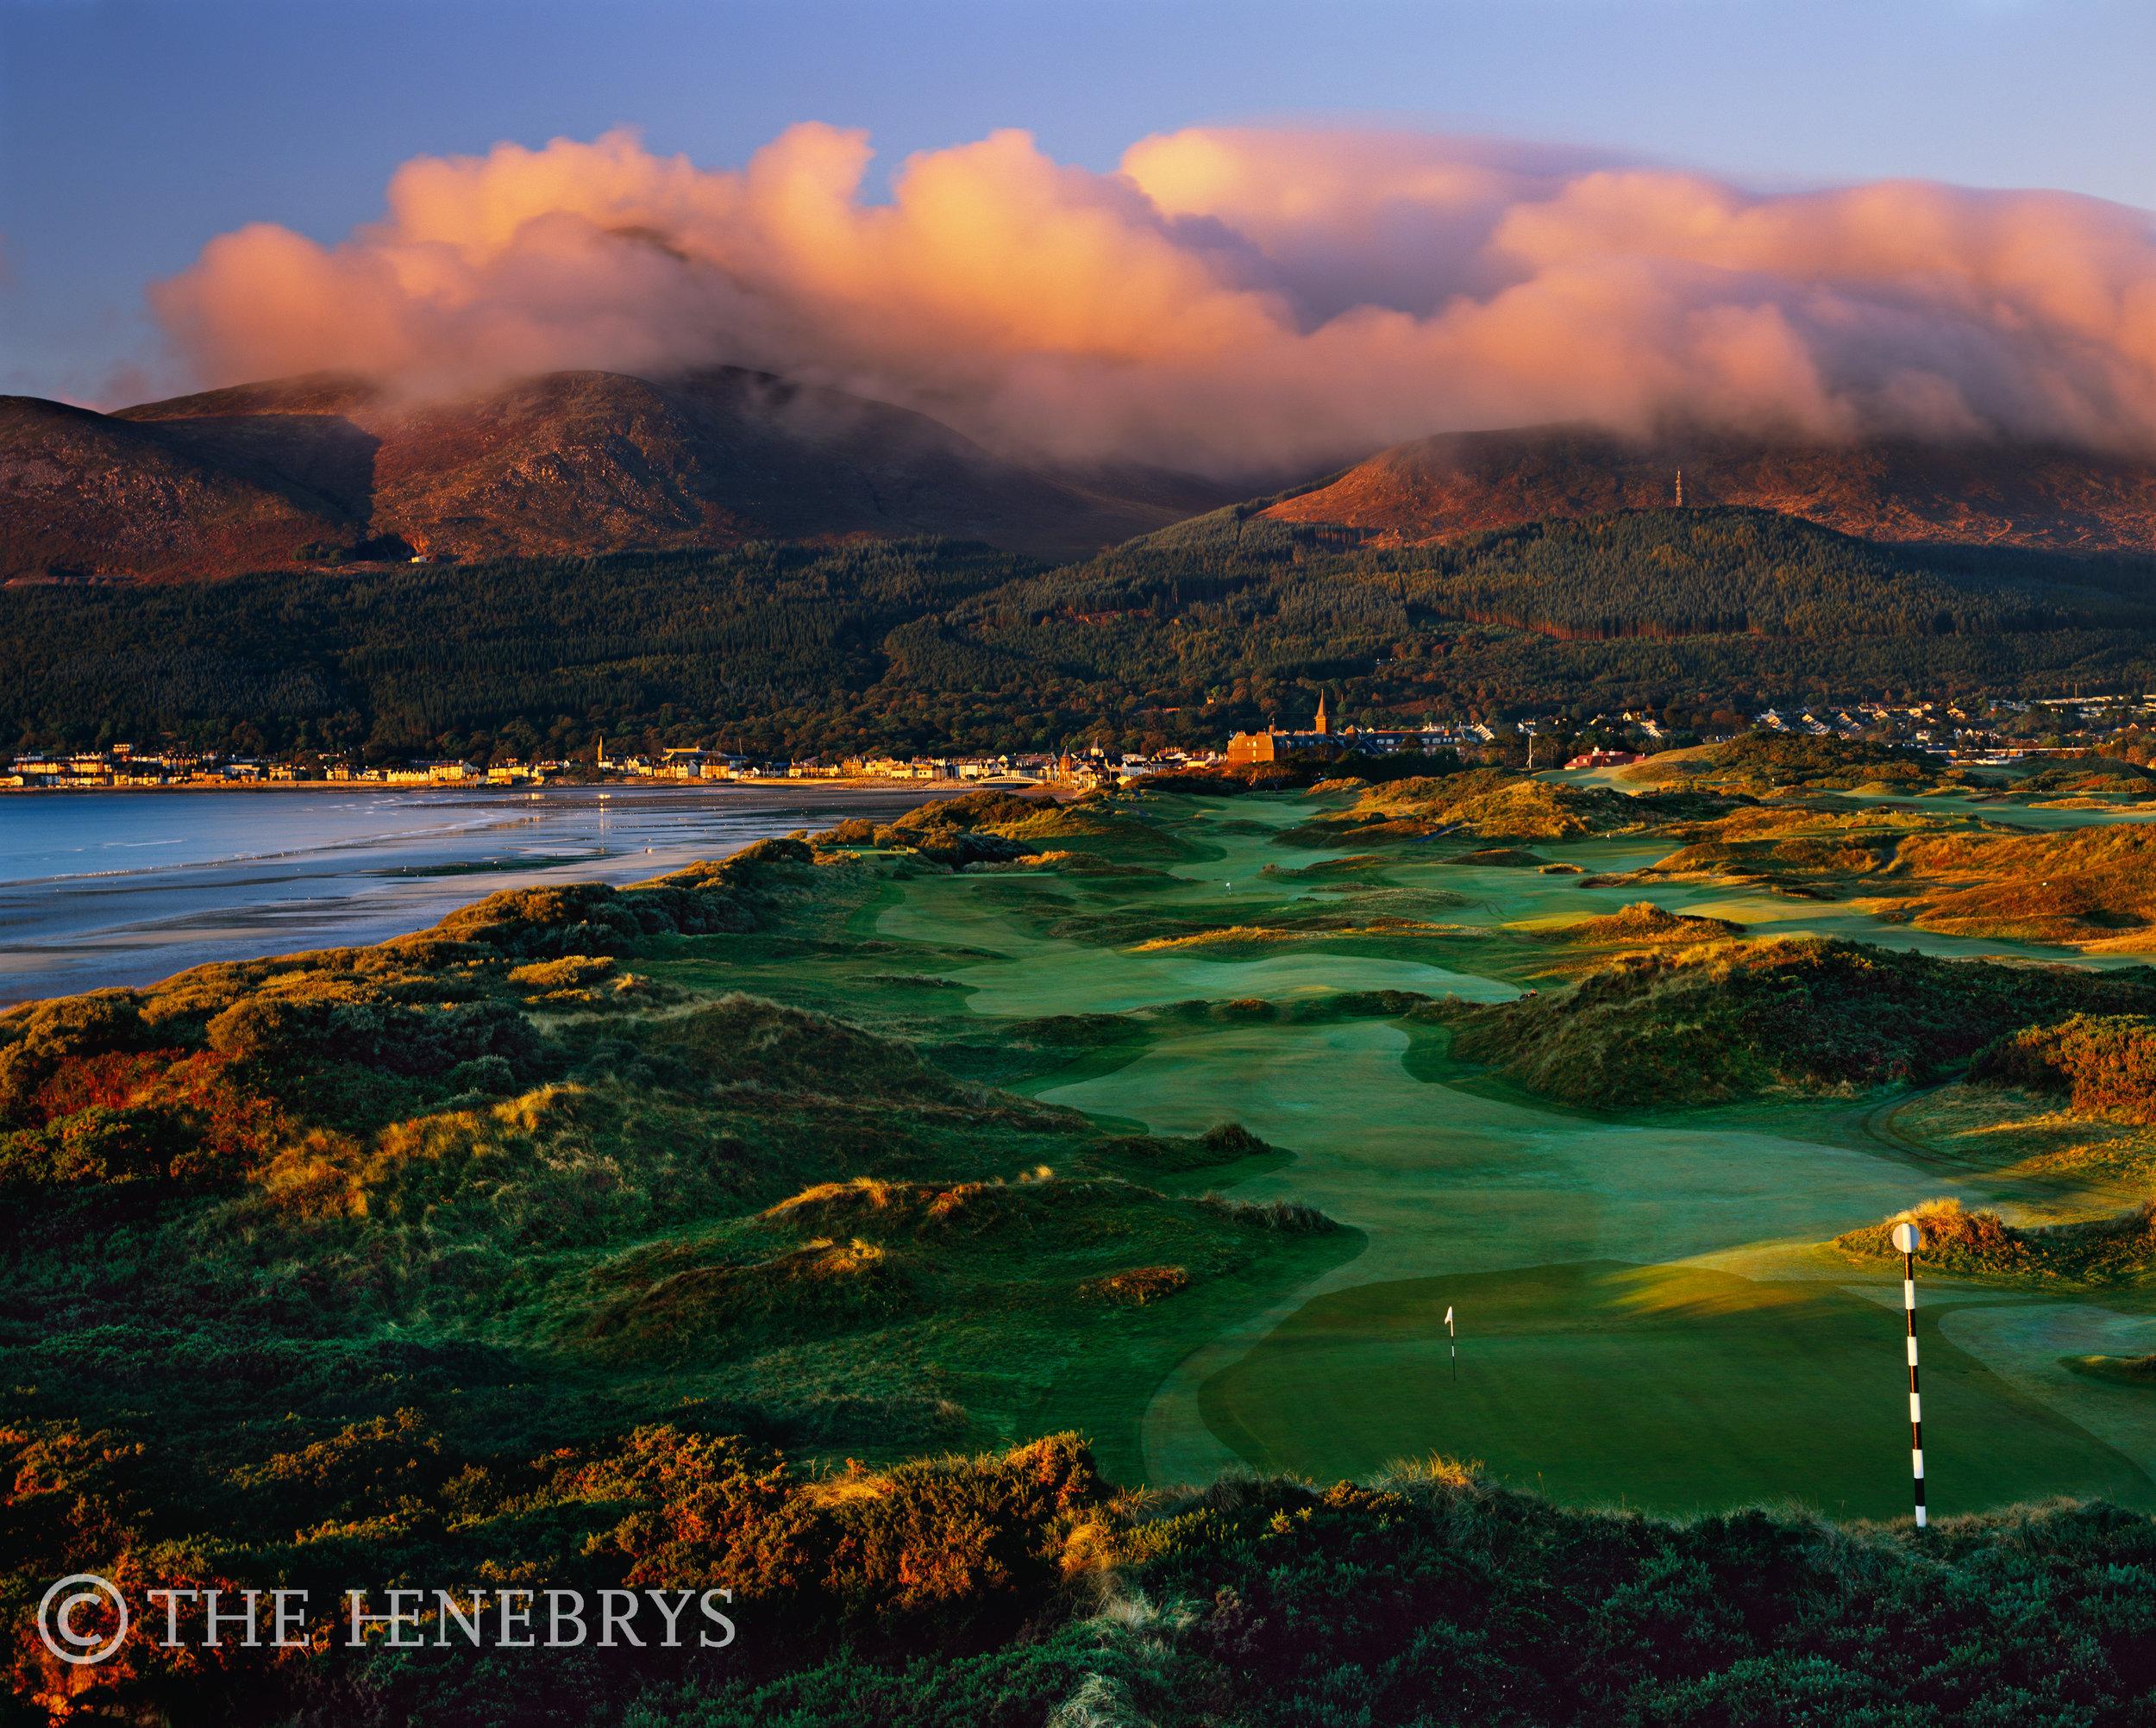 "Royal County Down Golf Club #03r ""A Glorious Morning"", Newcastle Co. Down, Ireland"